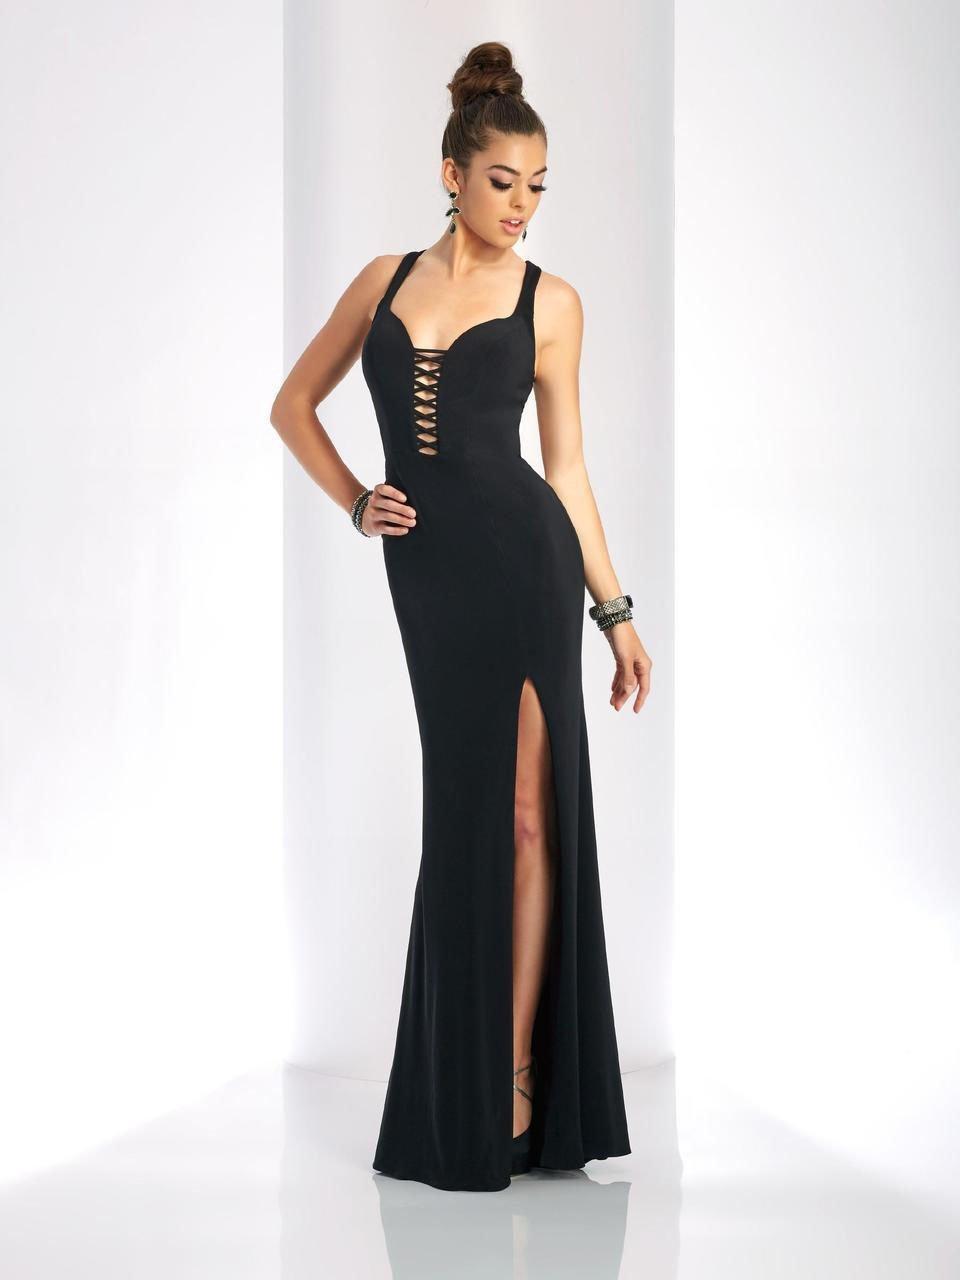 Clarisse - 3406 Plunging V-neck Sheath Dress